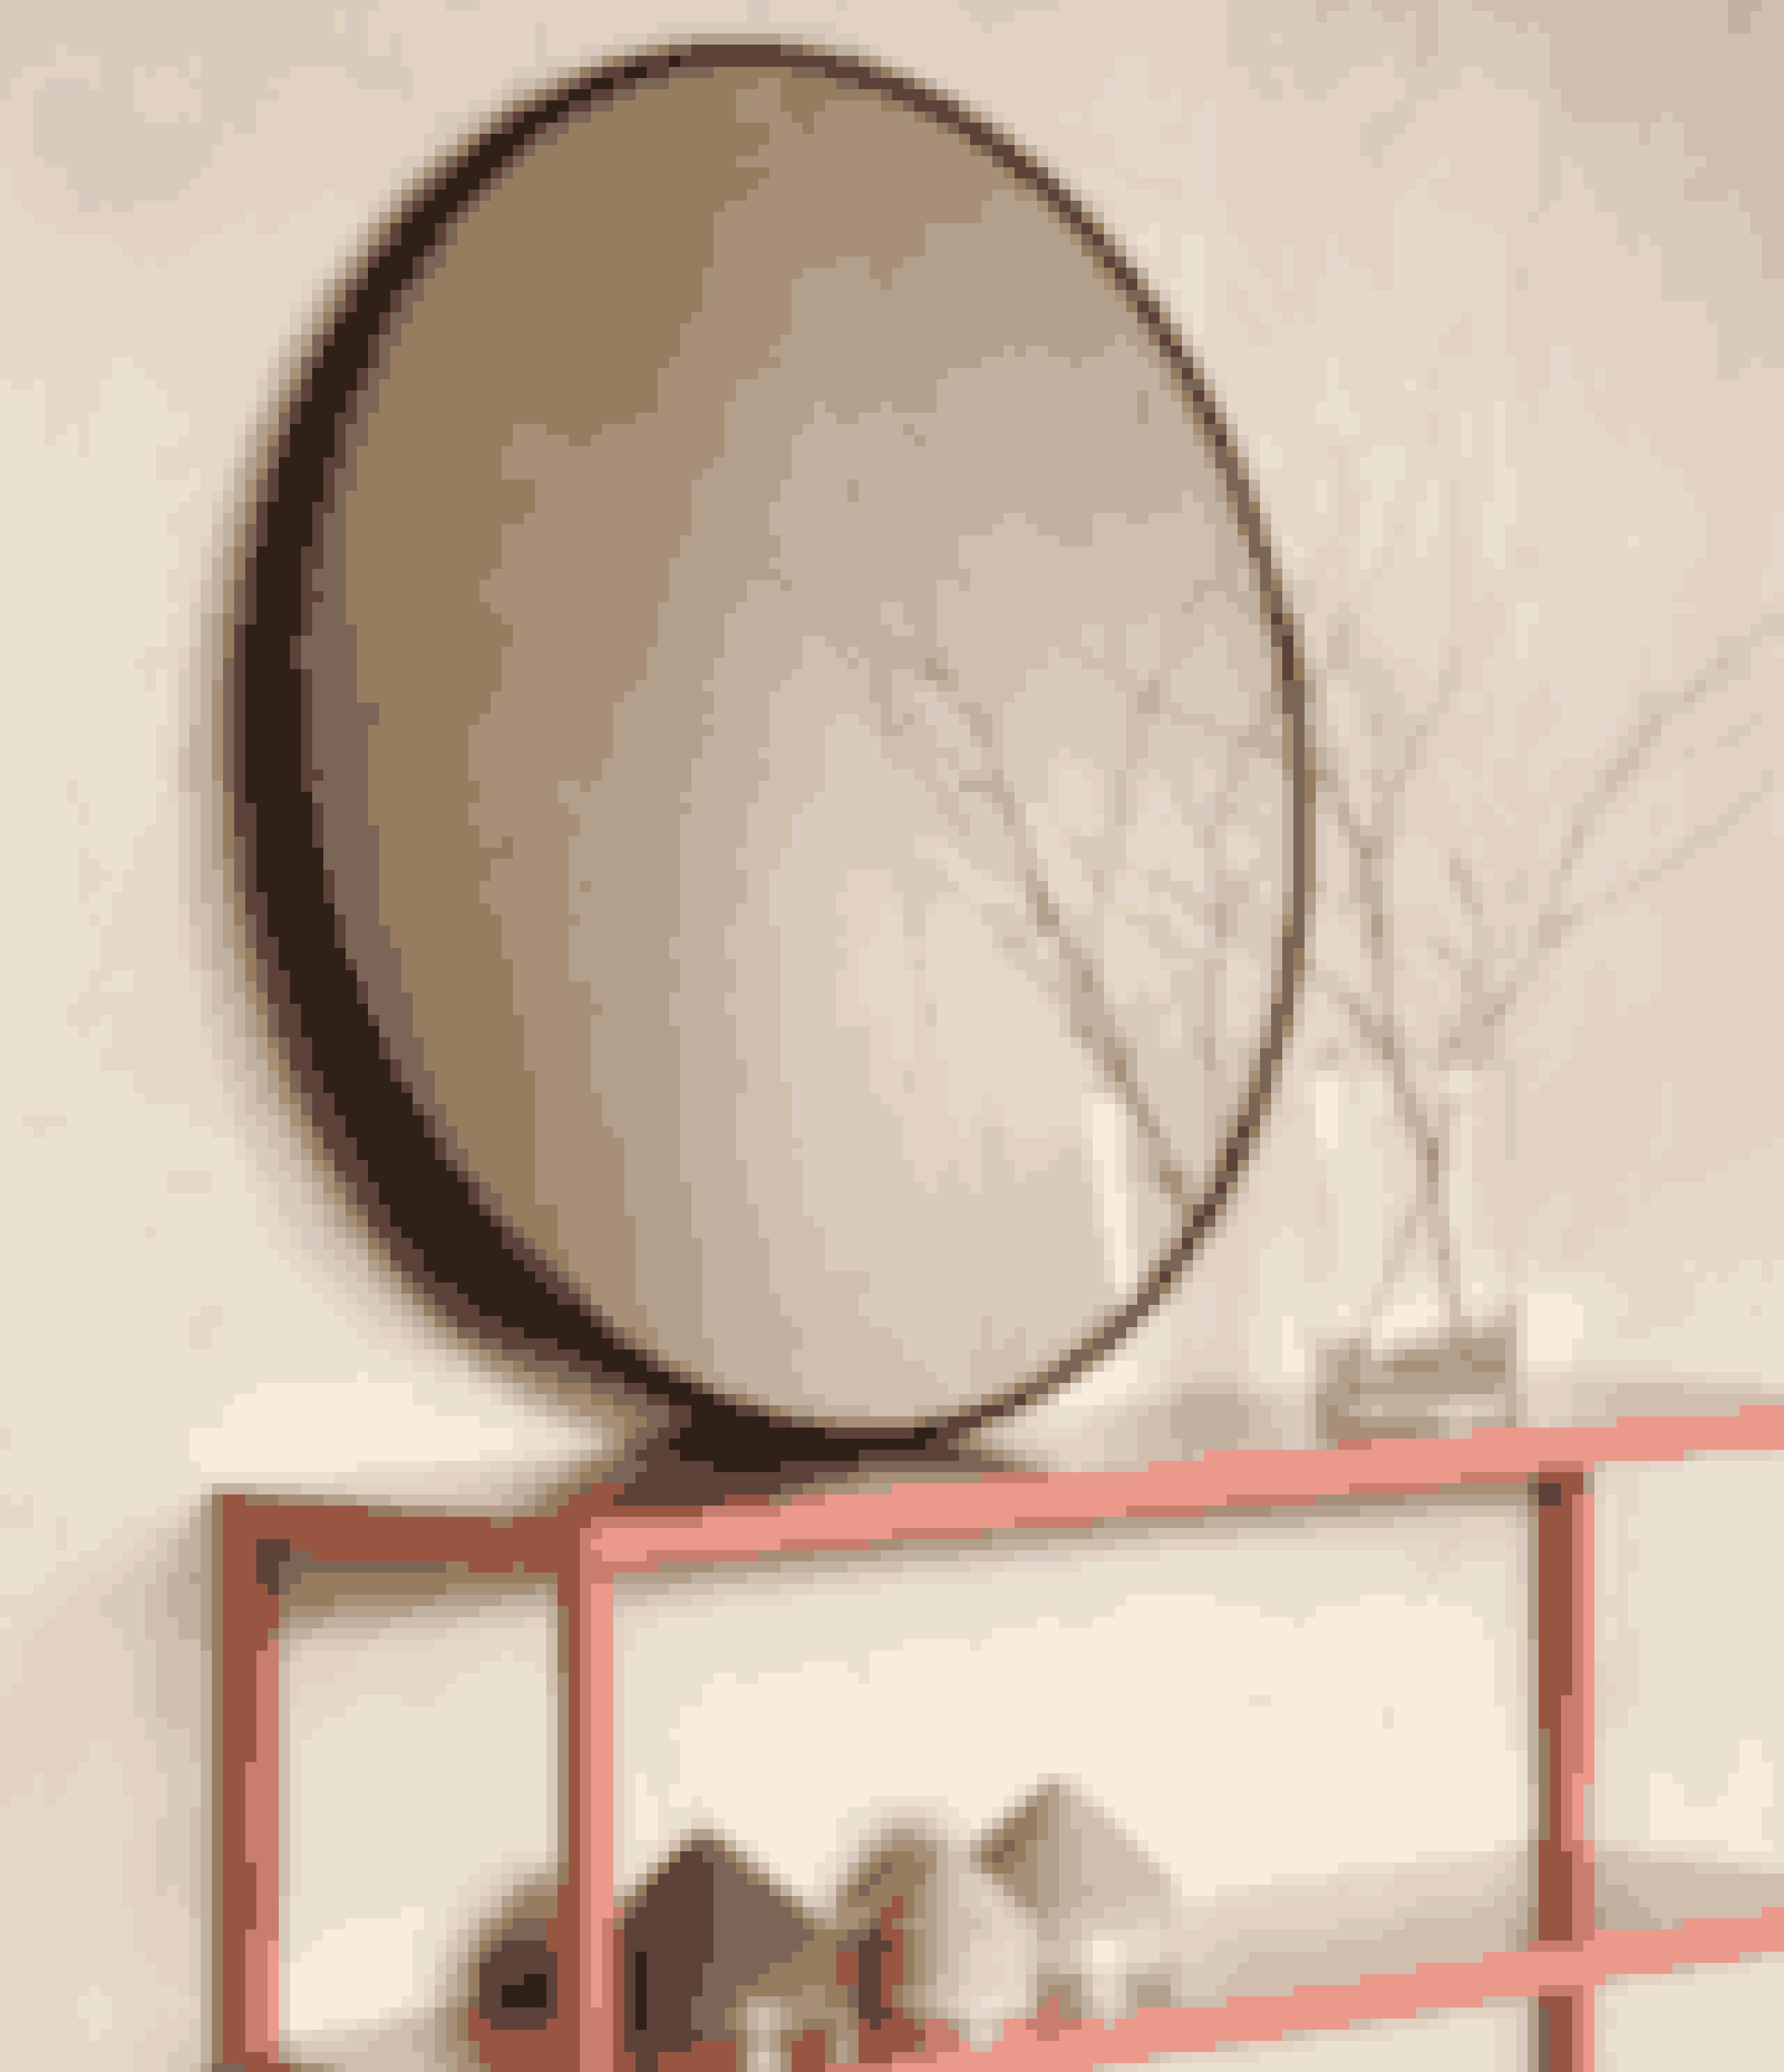 Spejl. Ø 70 cm, 198,00 kr.